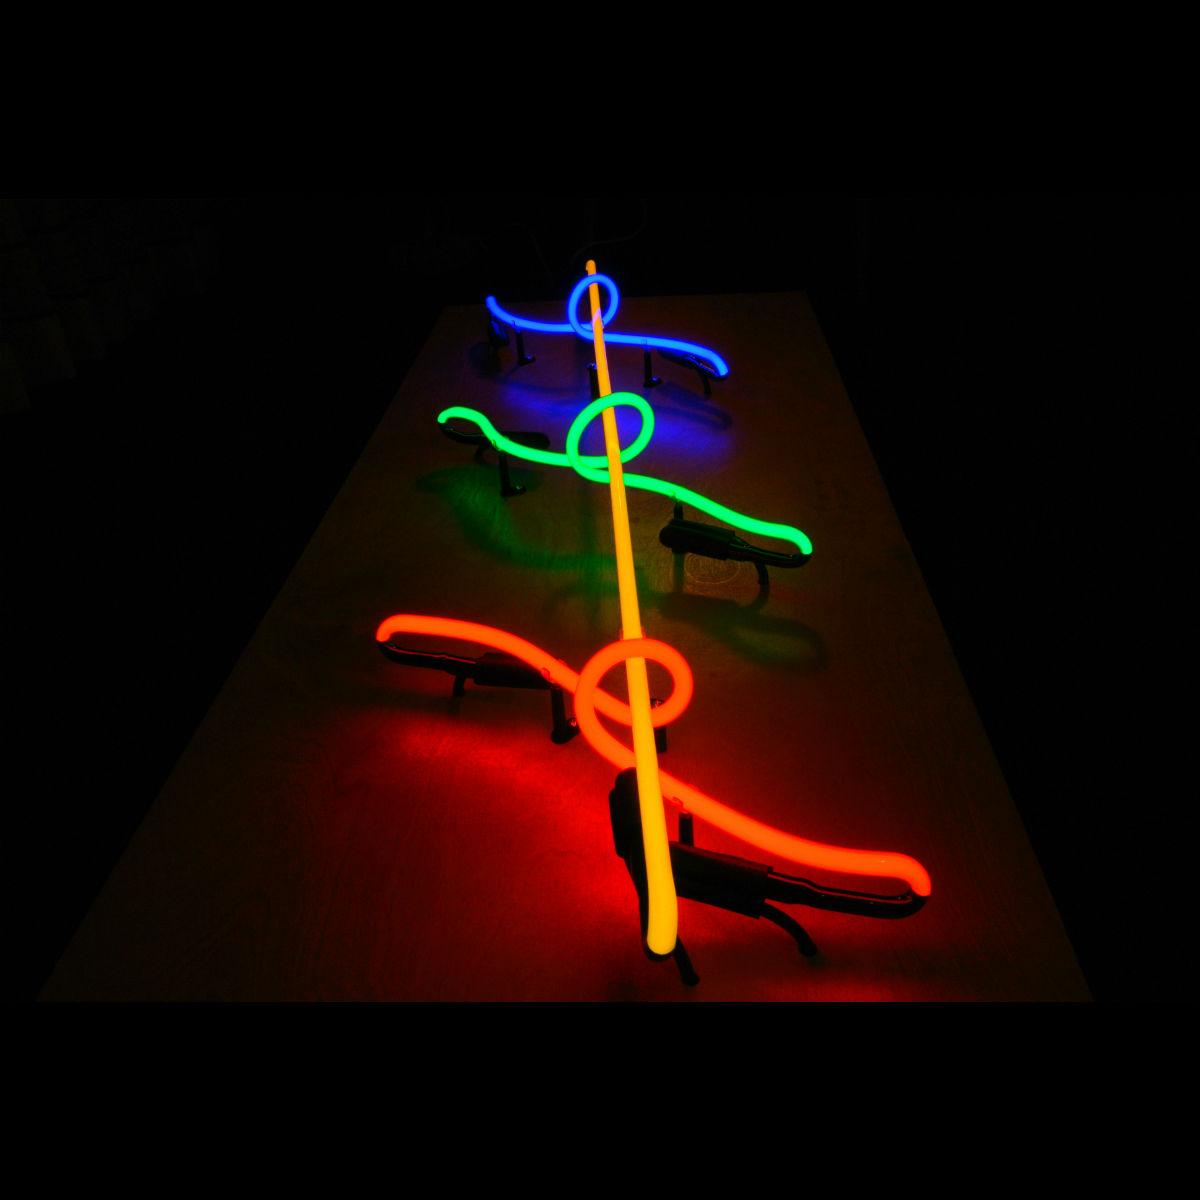 """Contemporary Dance"" Neon Light Sculpture by John Barton - BartonNeonMagic.com"